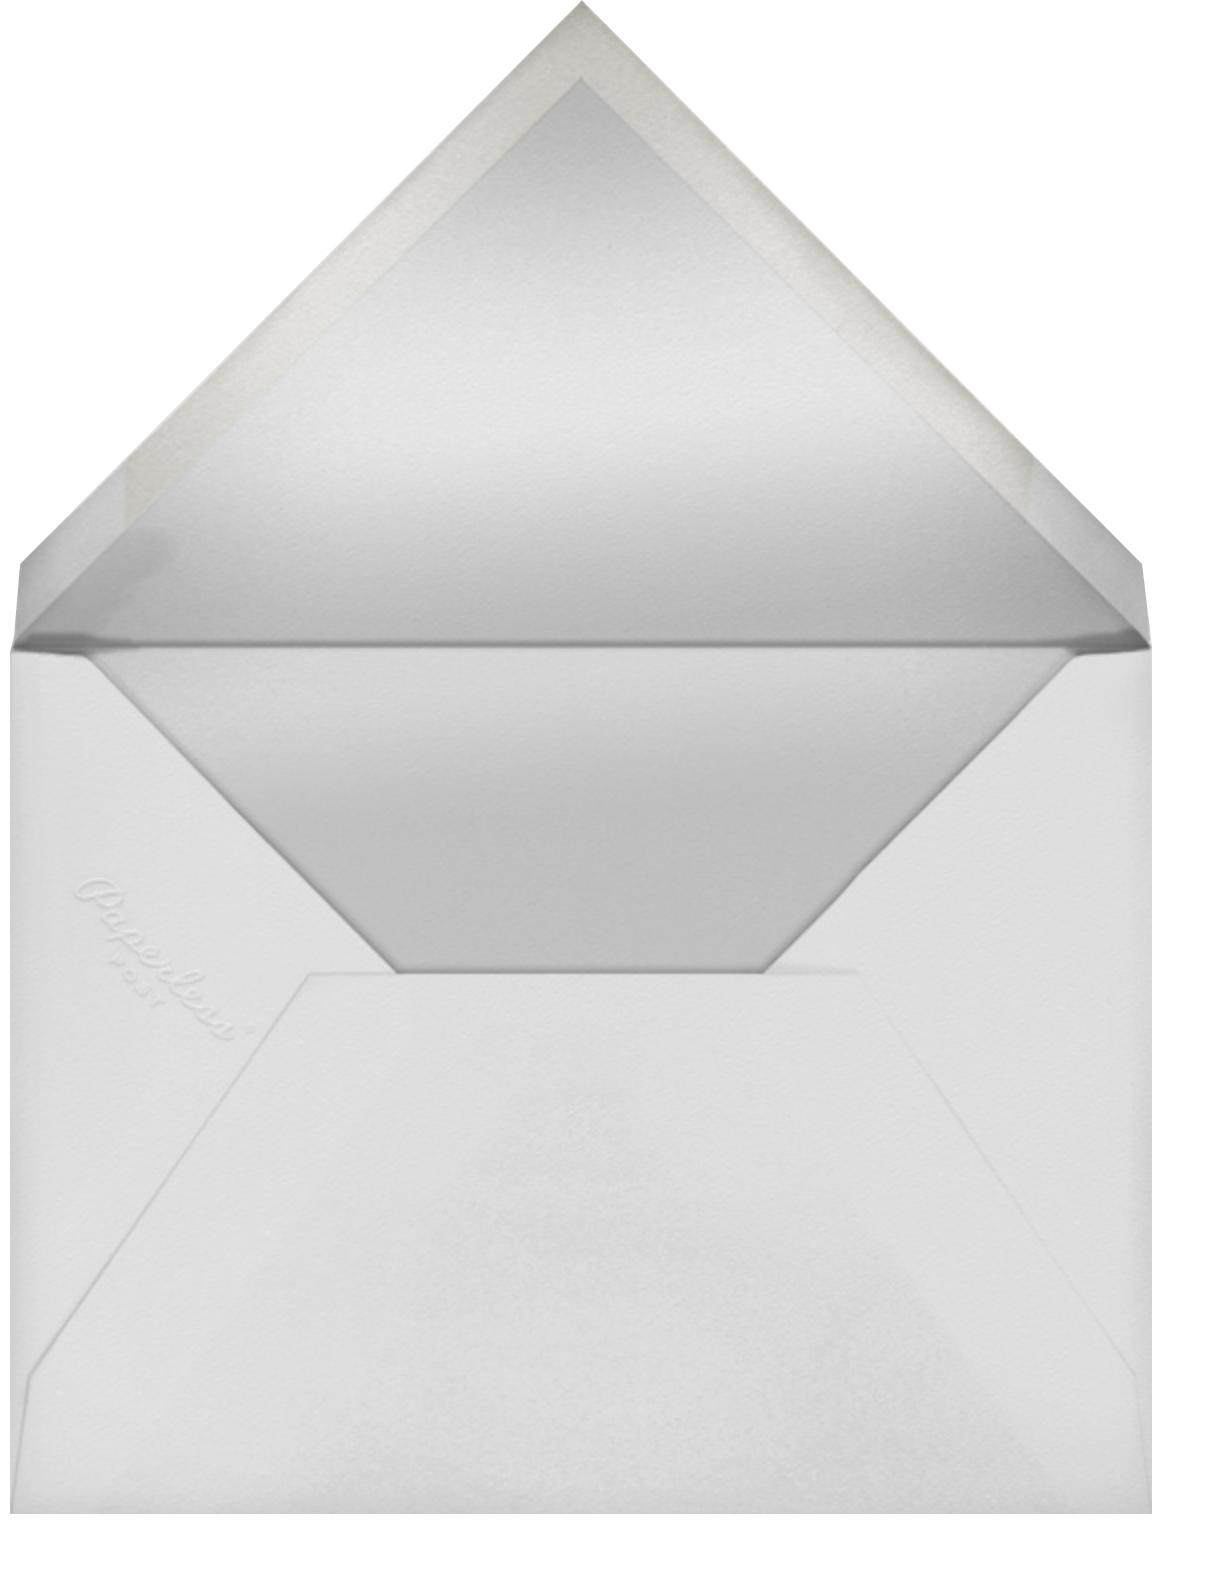 Chincoteague (Menu) - Paperless Post - Menus and programs - envelope back